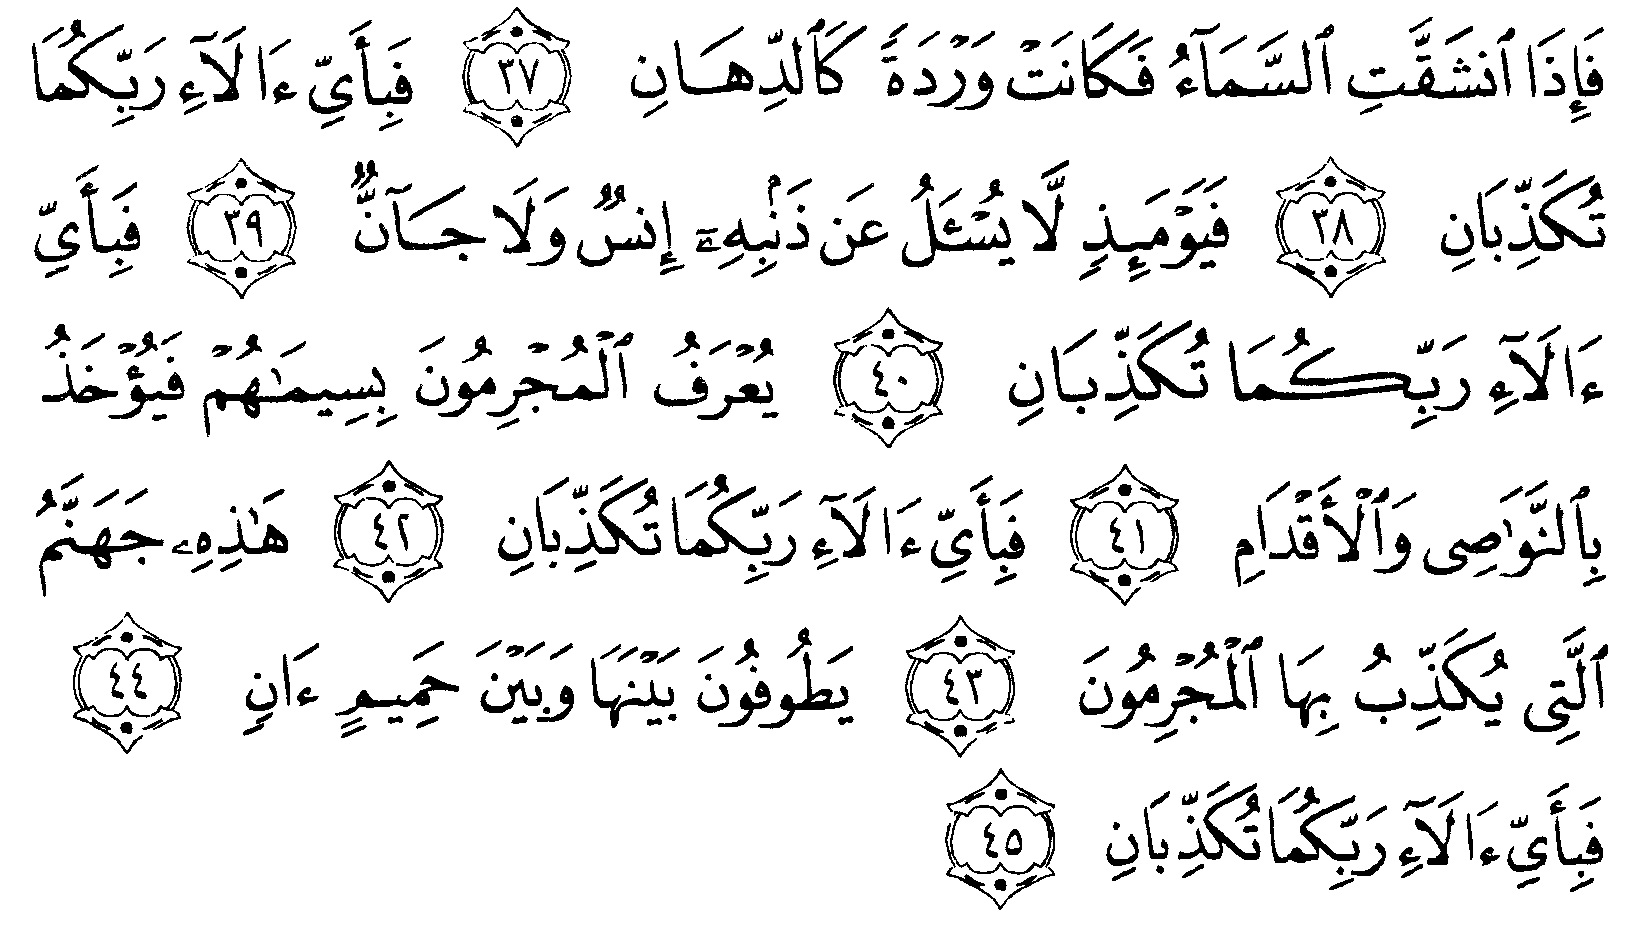 Tafsir Al Quran Surah Ar Rahman 4 Alquranmulia